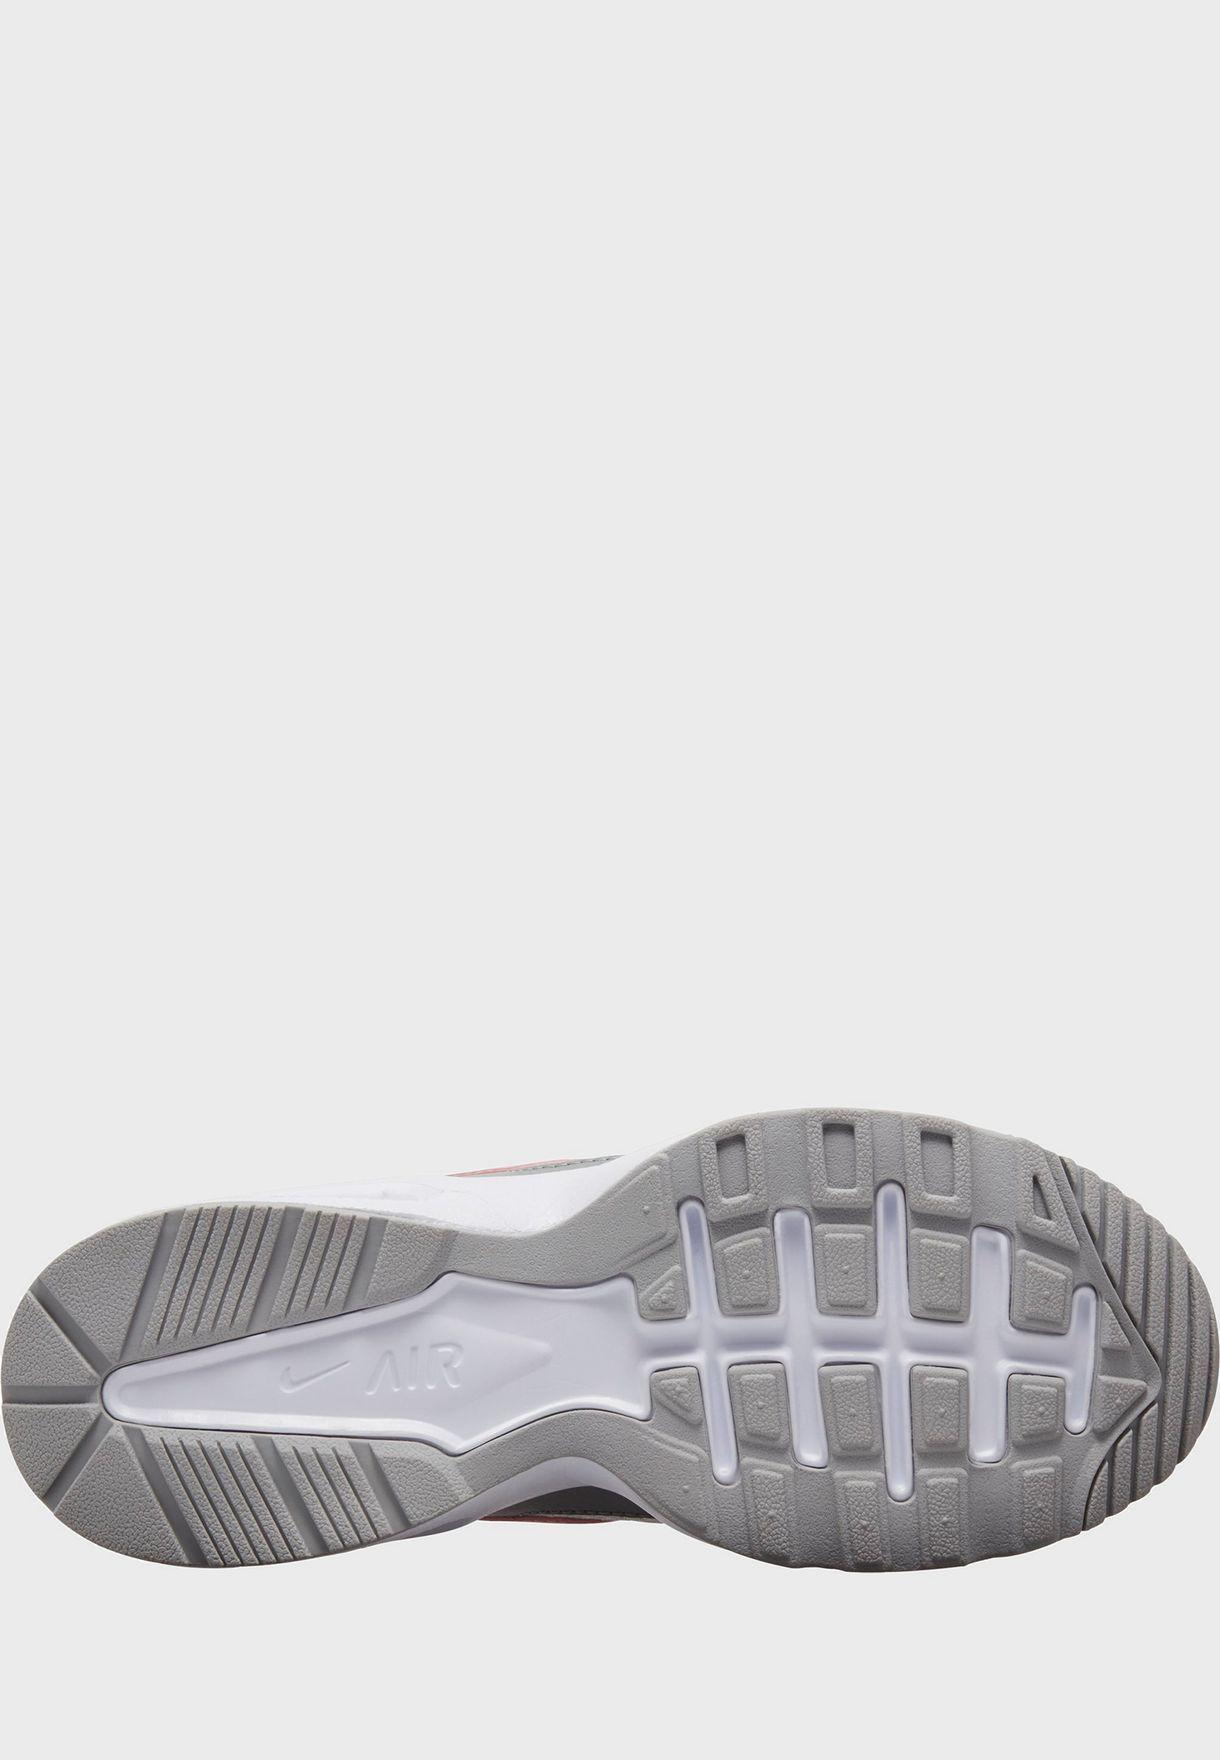 حذاء اير ماكس فيوجن